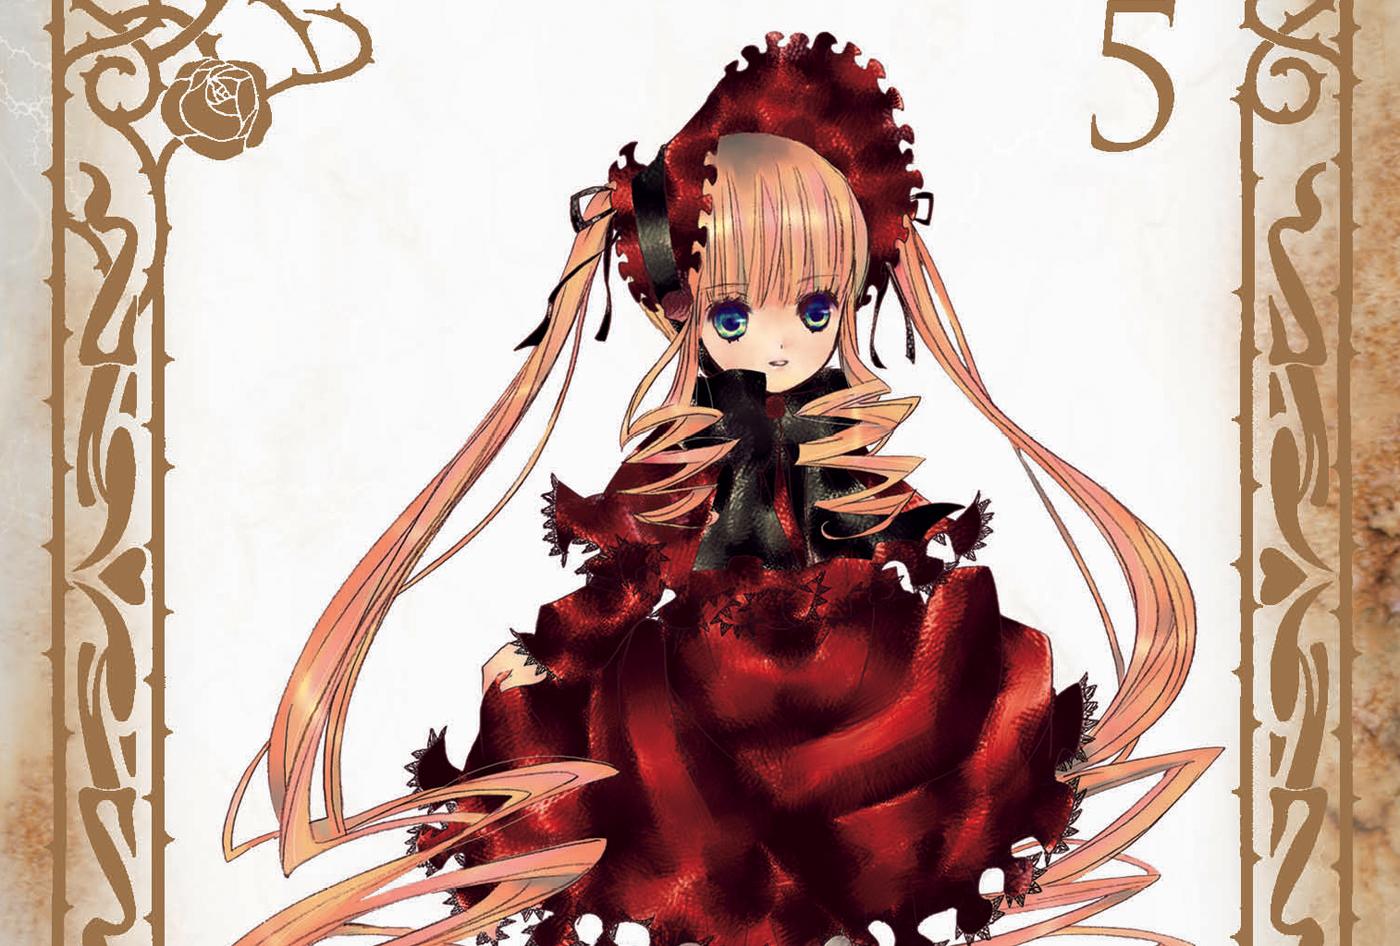 Rozen Maiden,,manga y animé, fotos, sinopsis Anime